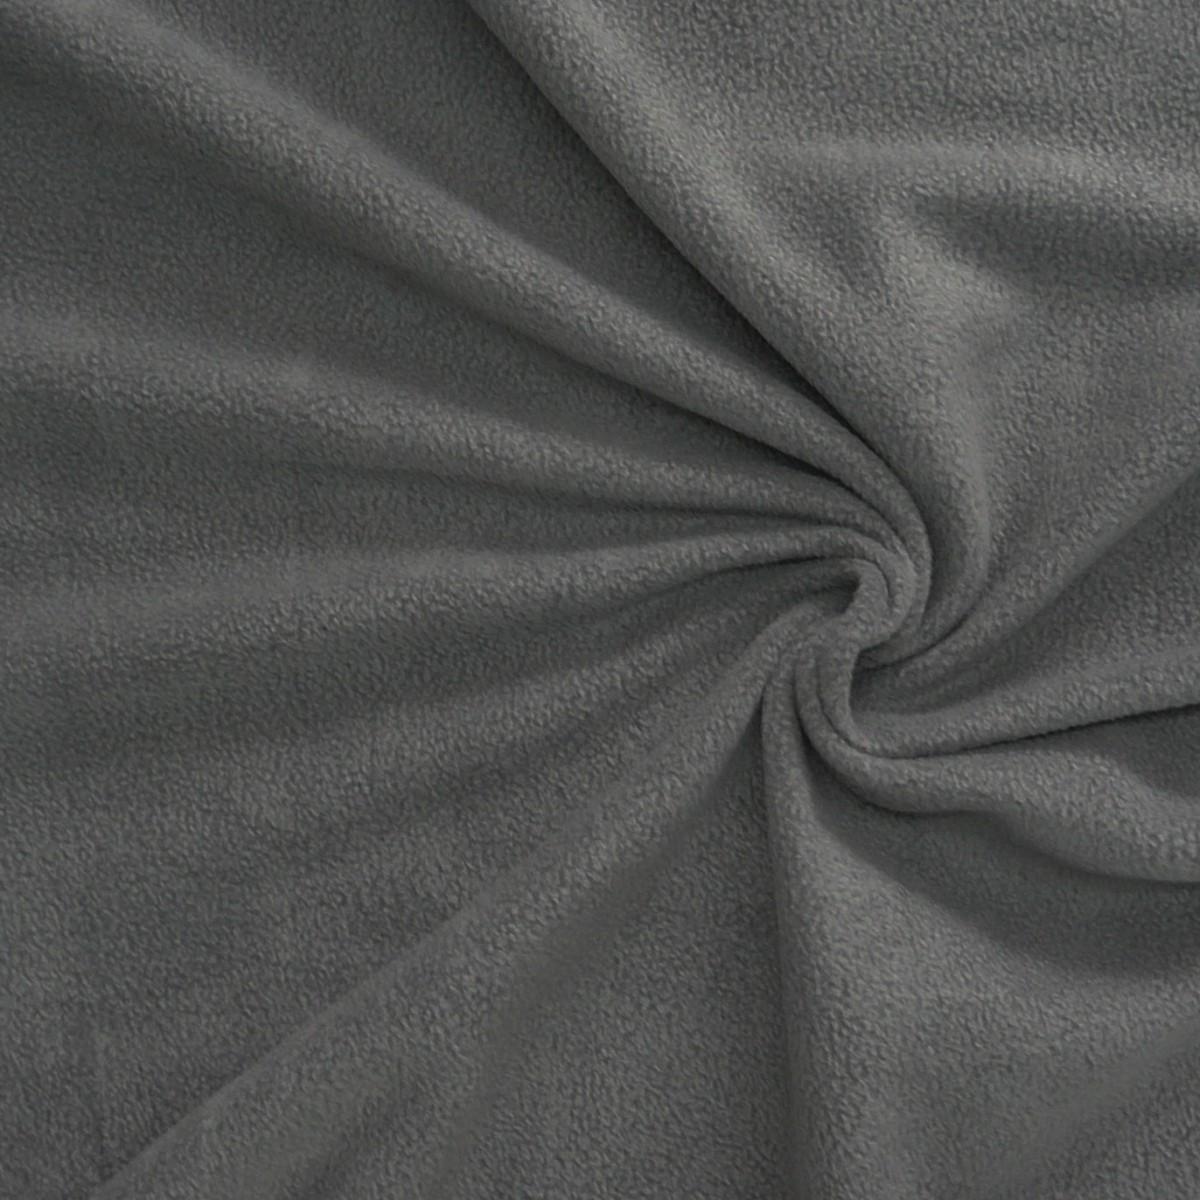 polar fleece stoffe fleecestoff dunkelgrau stoffe zubeh r stoffe fleece pl schstoffe. Black Bedroom Furniture Sets. Home Design Ideas